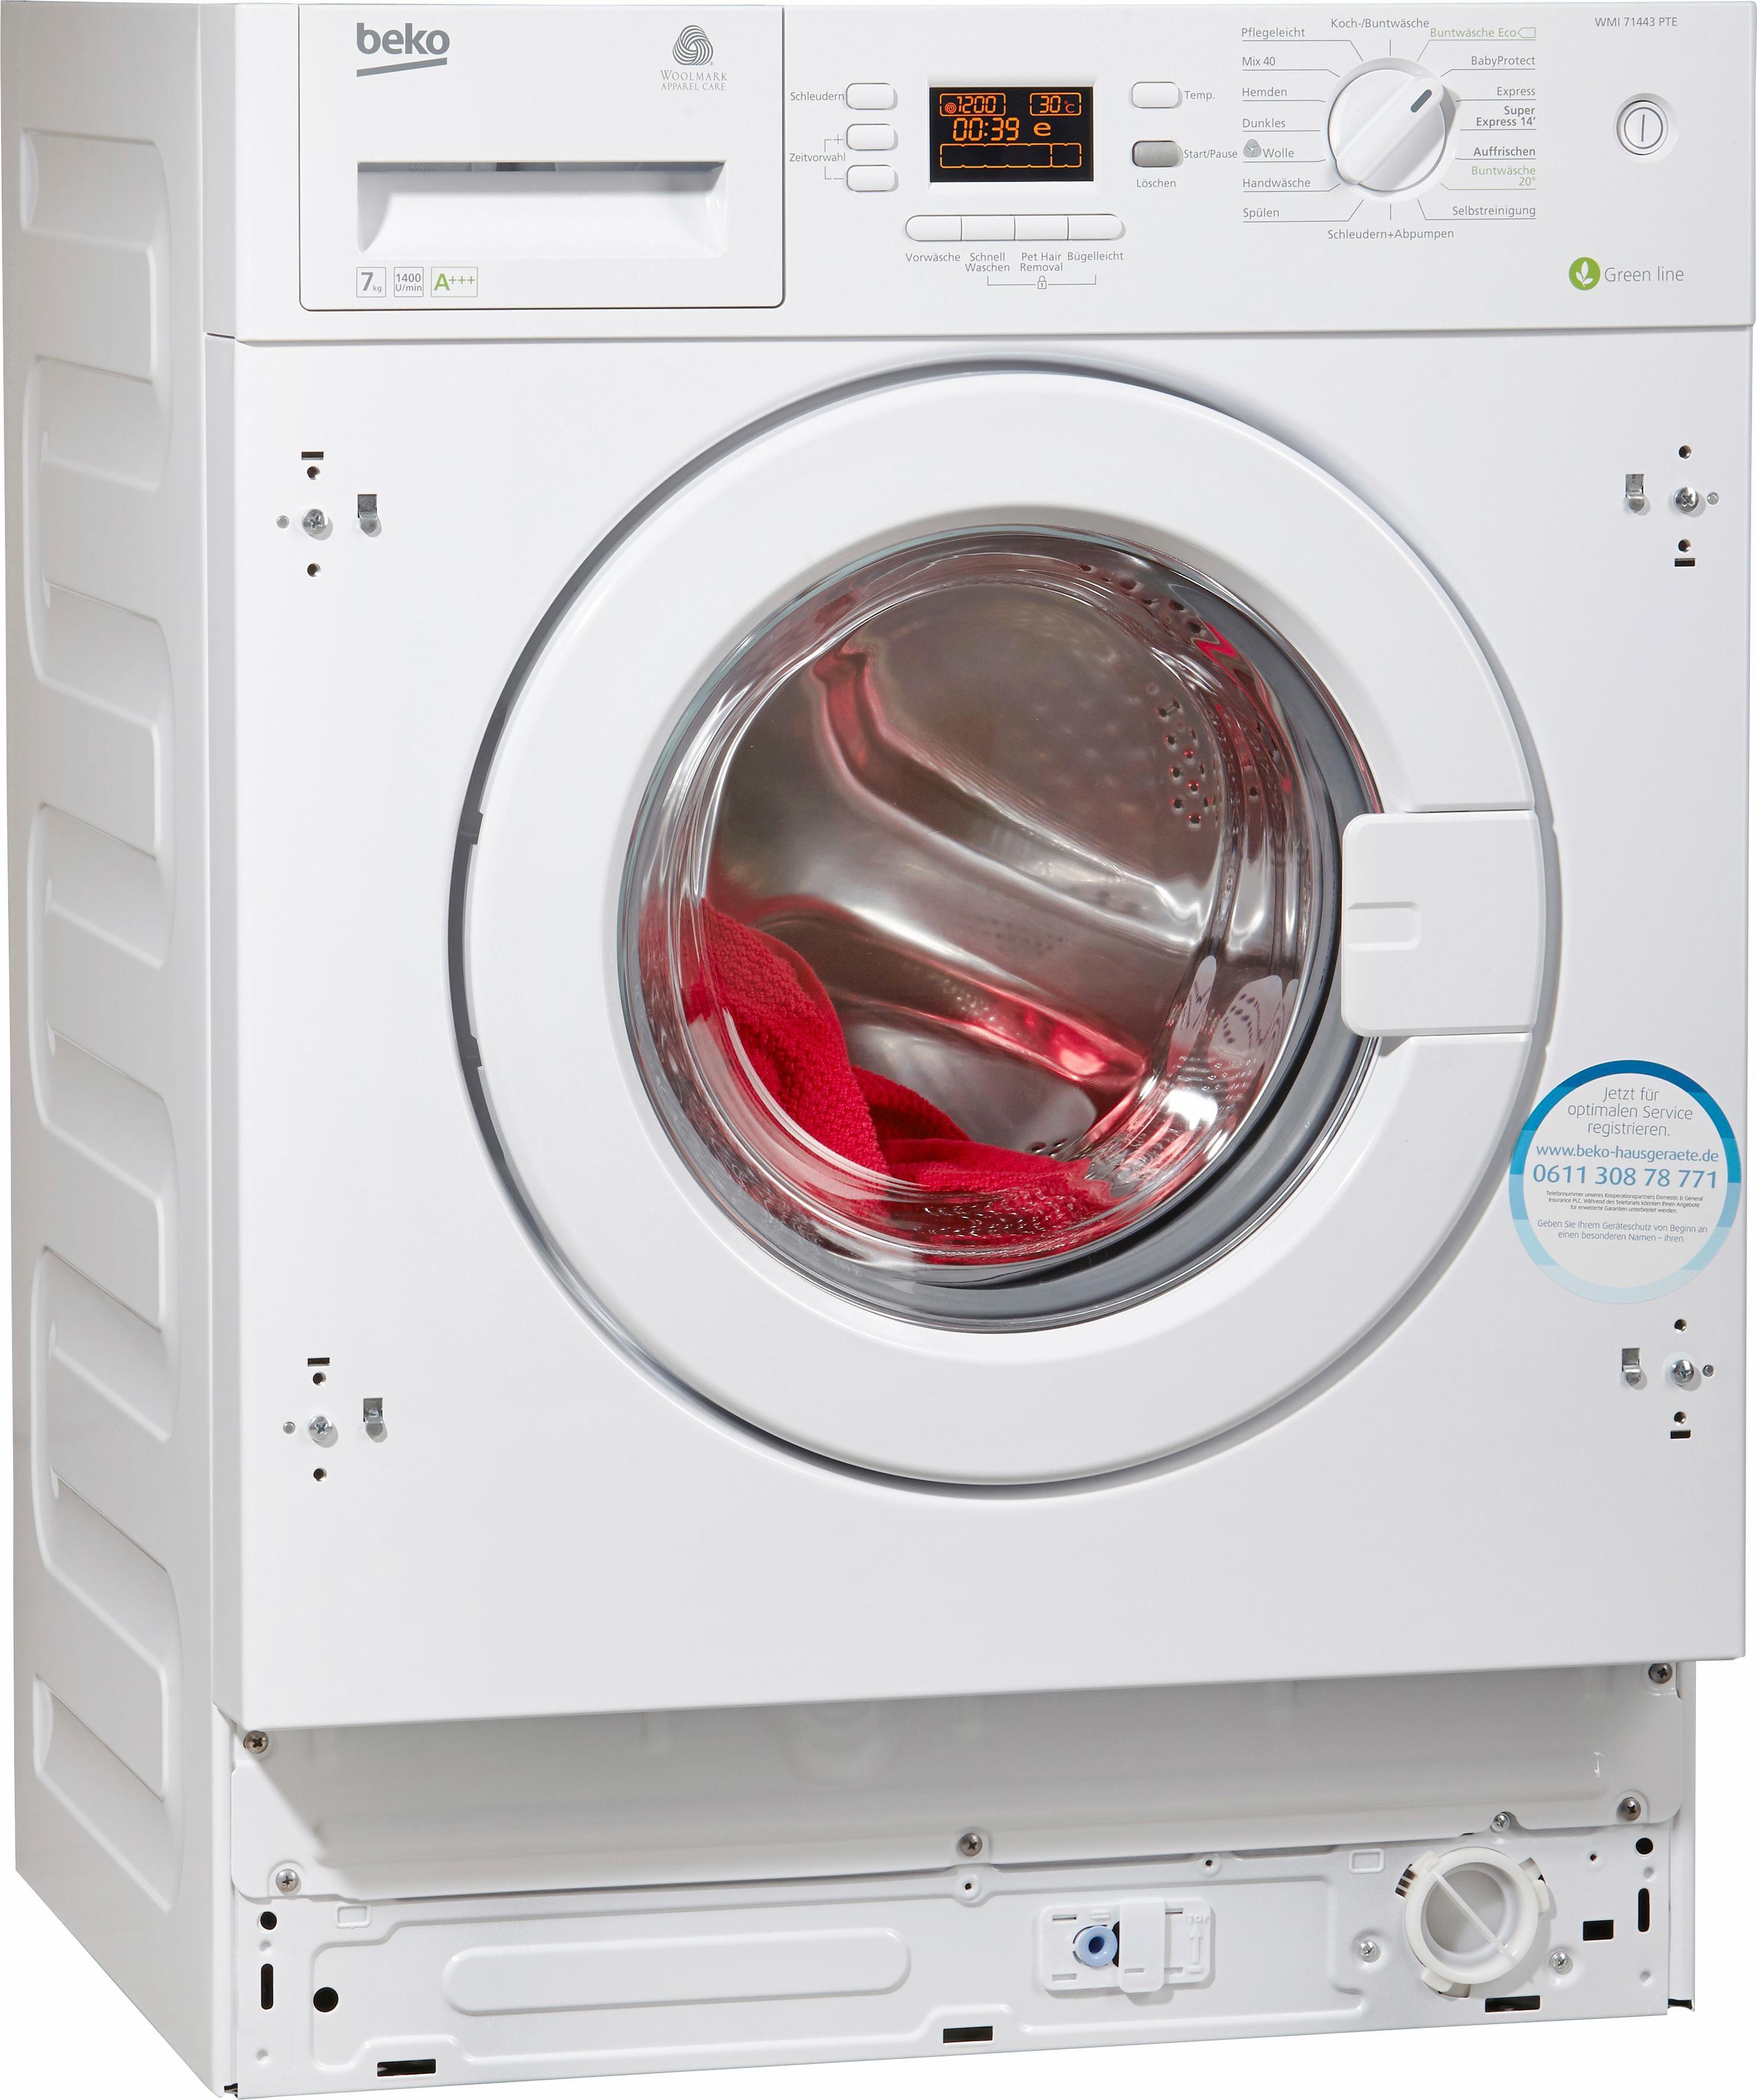 BEKO Einbau-Waschmaschine WMI 71443 PTE, A+++, 7 kg, 1400 U/Min